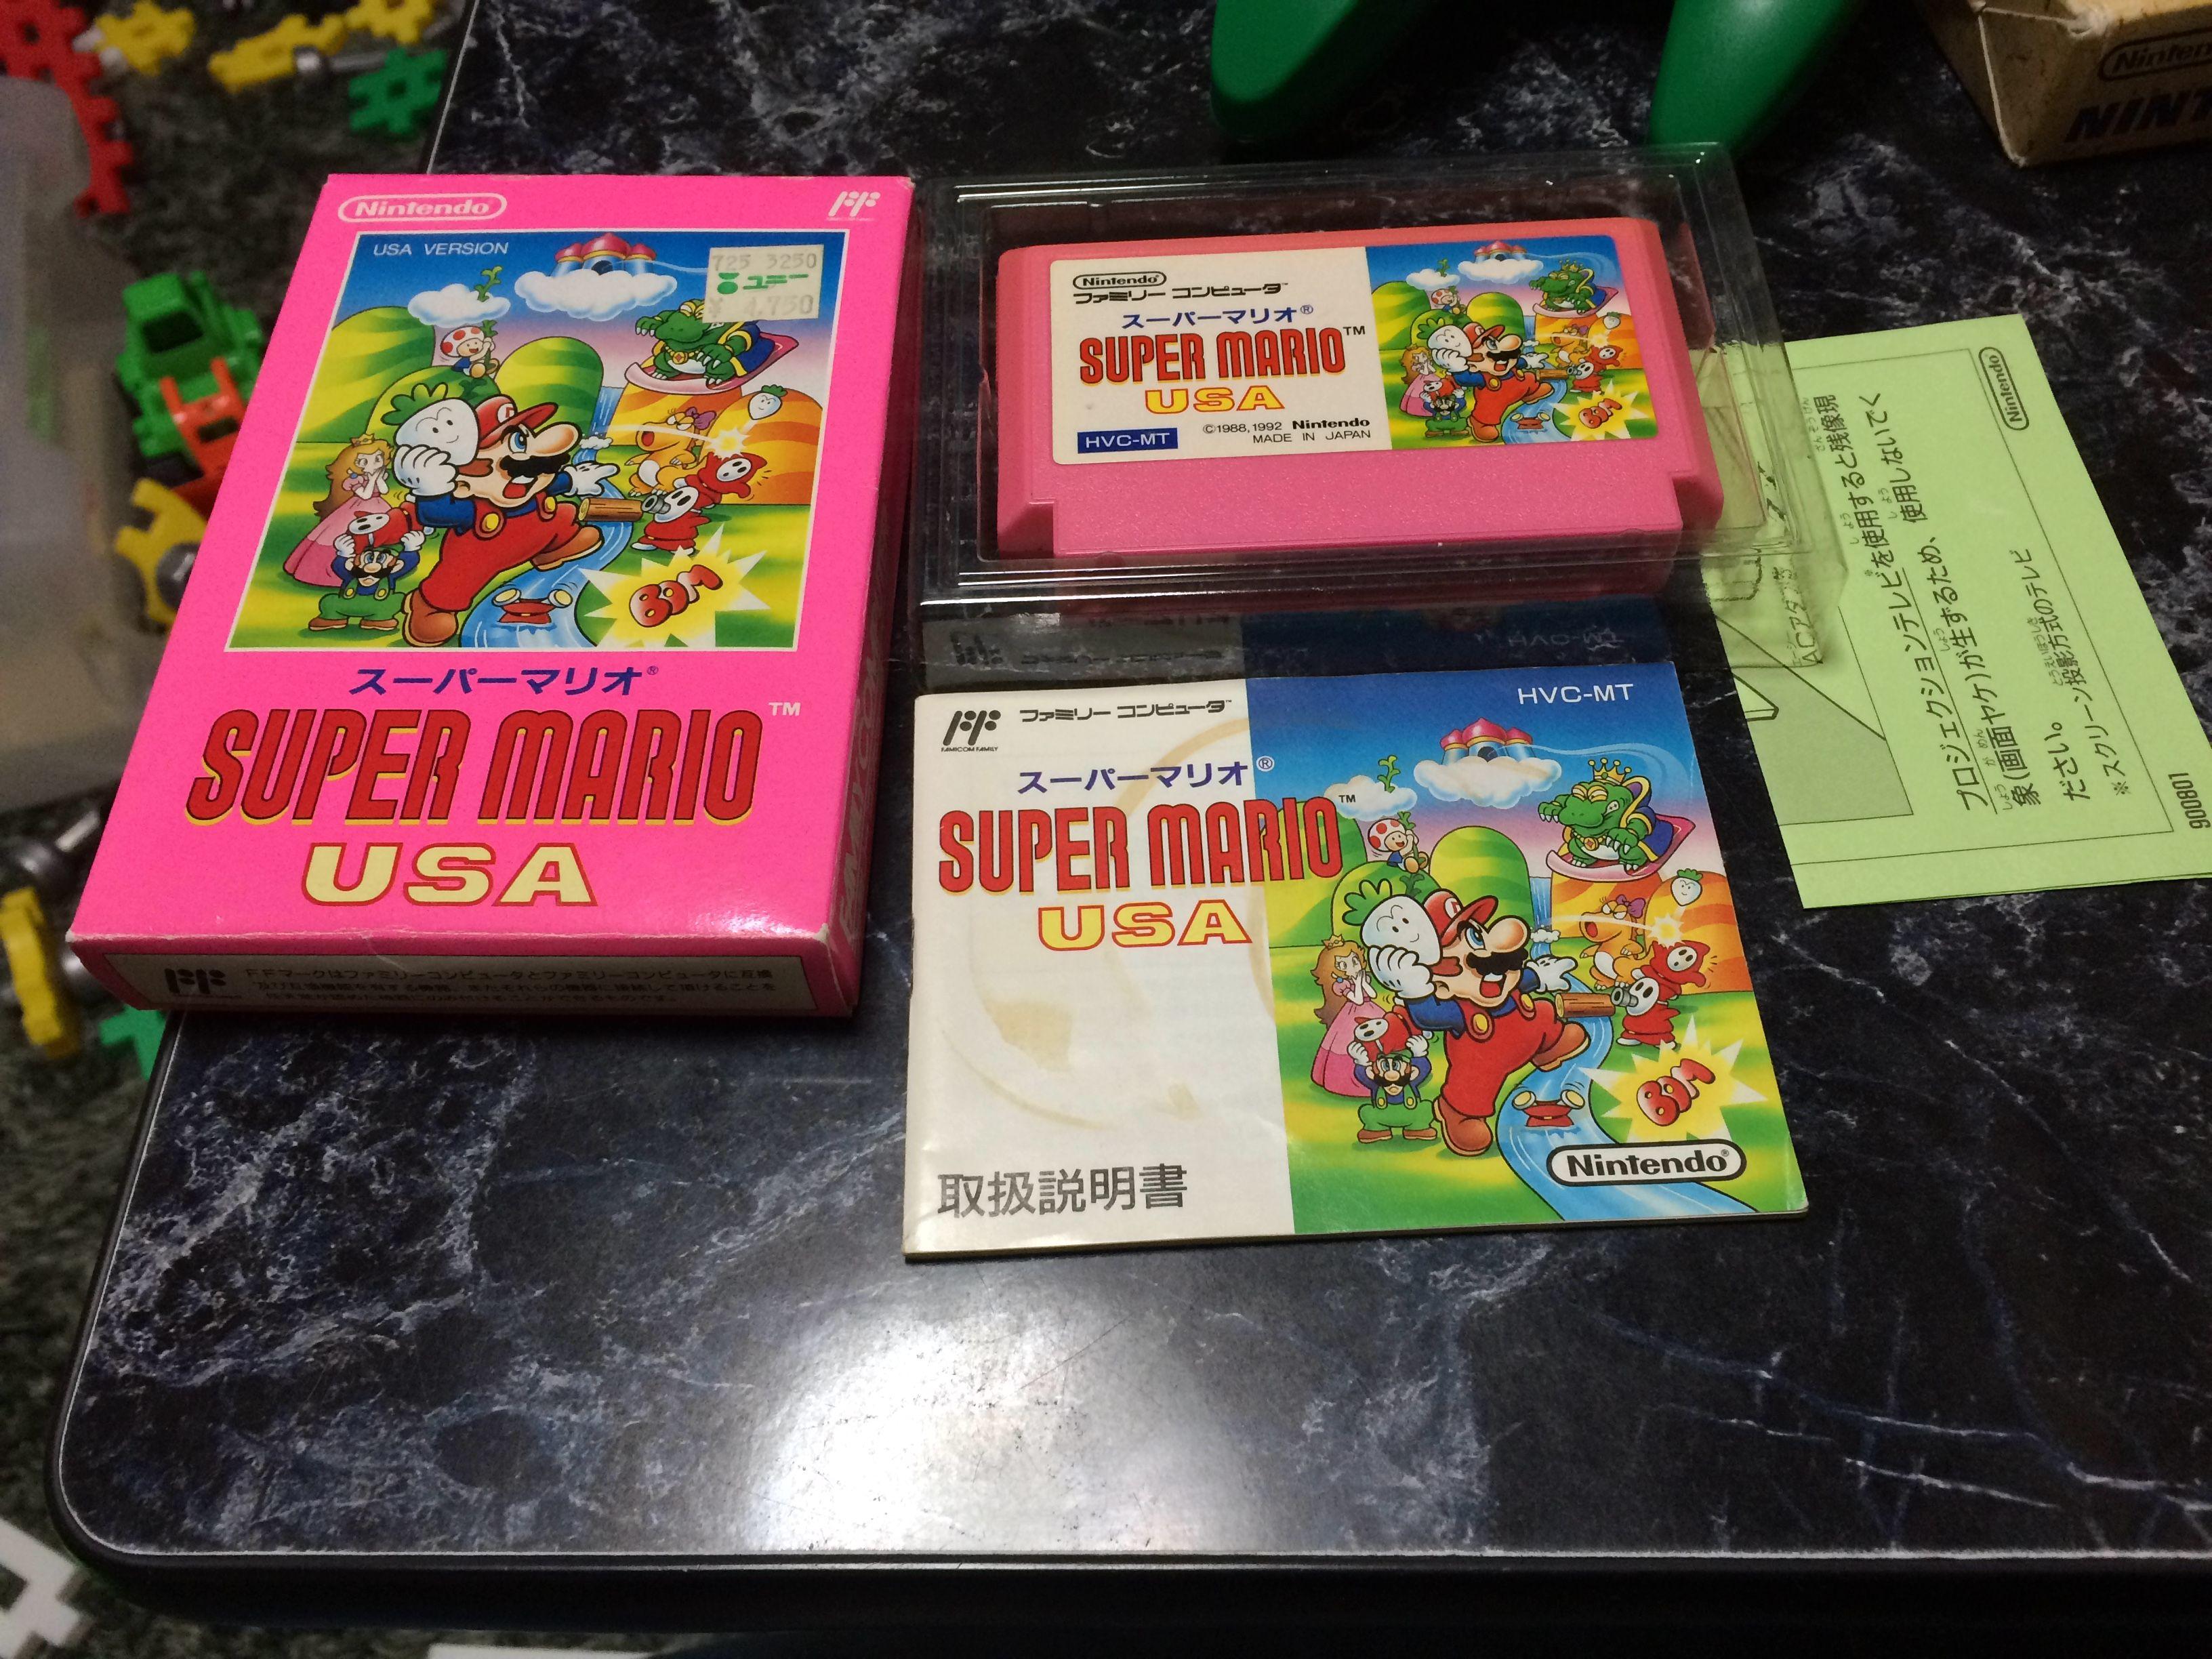 Super Mario USA - the Japanese version of Super Mario Bros